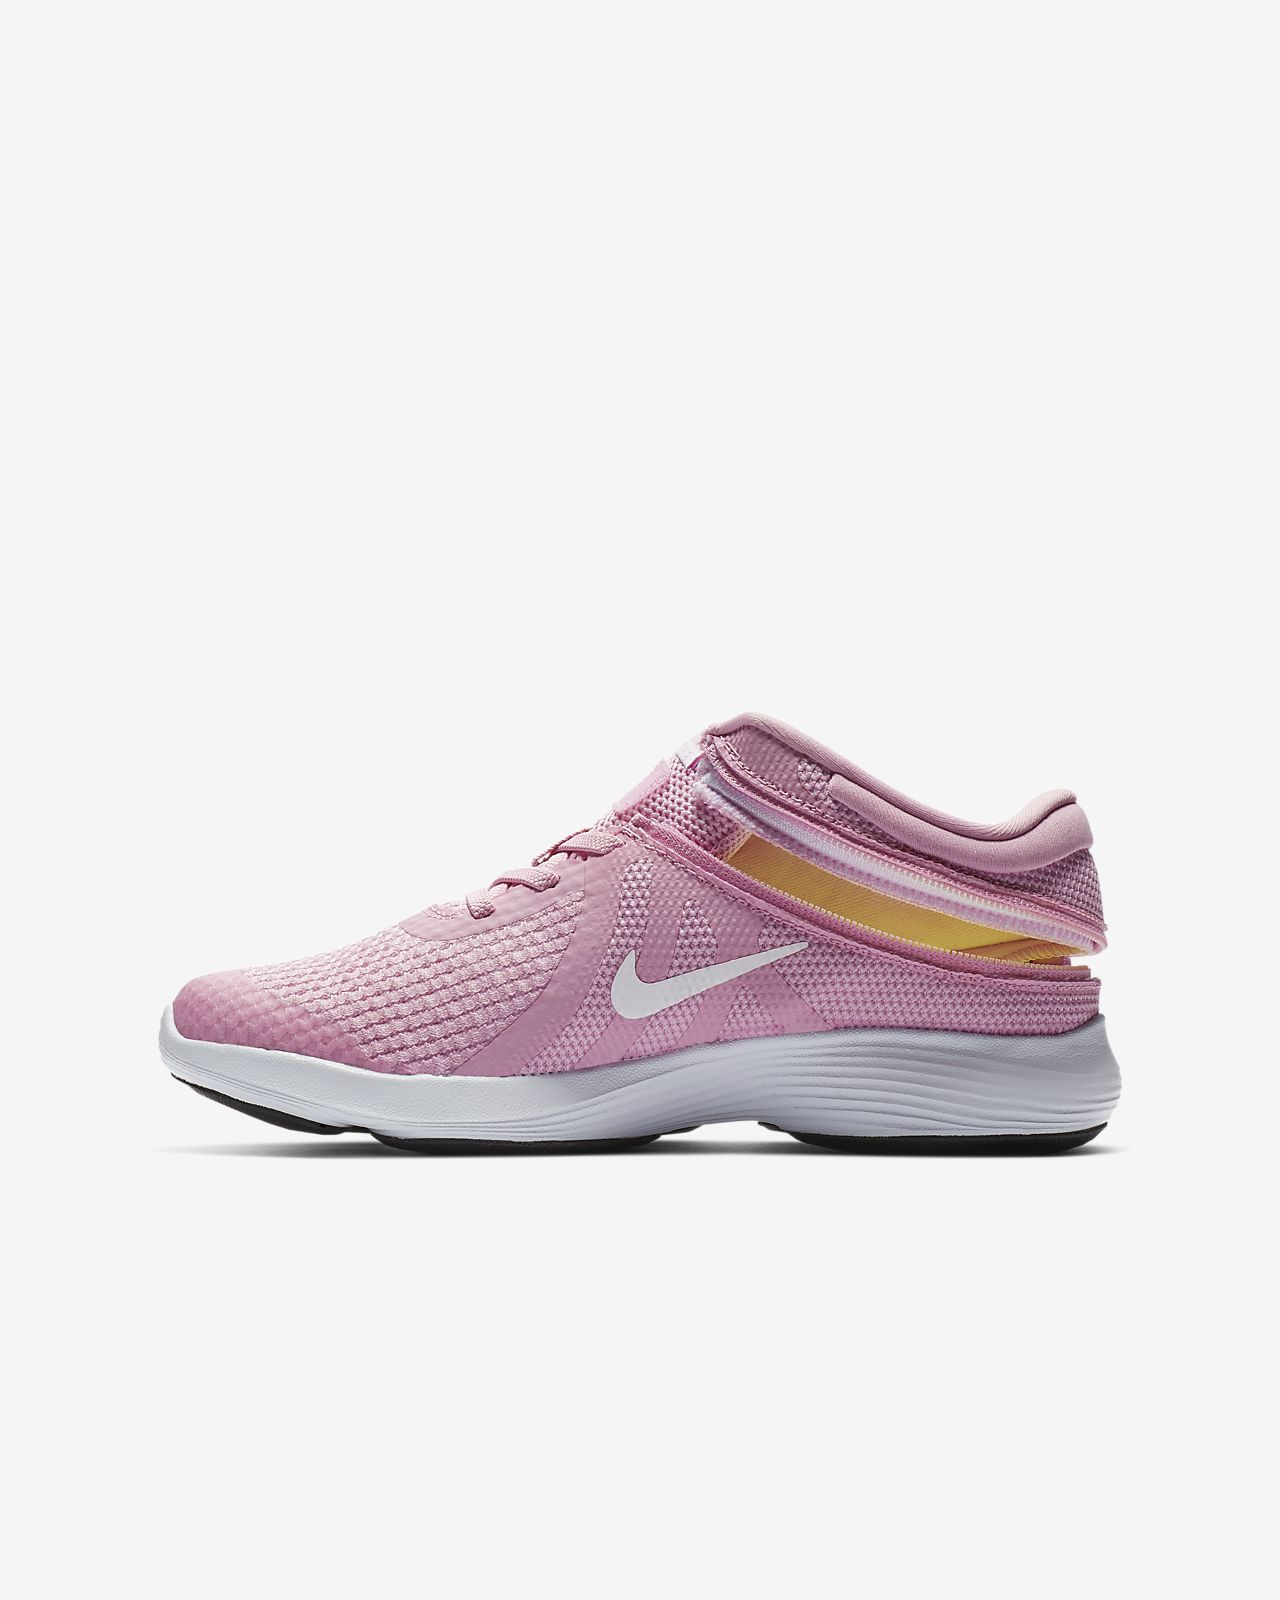 58a68e9ee3a Nike Revolution 4 FlyEase Older Kids  Running Shoe. Nike.com CA